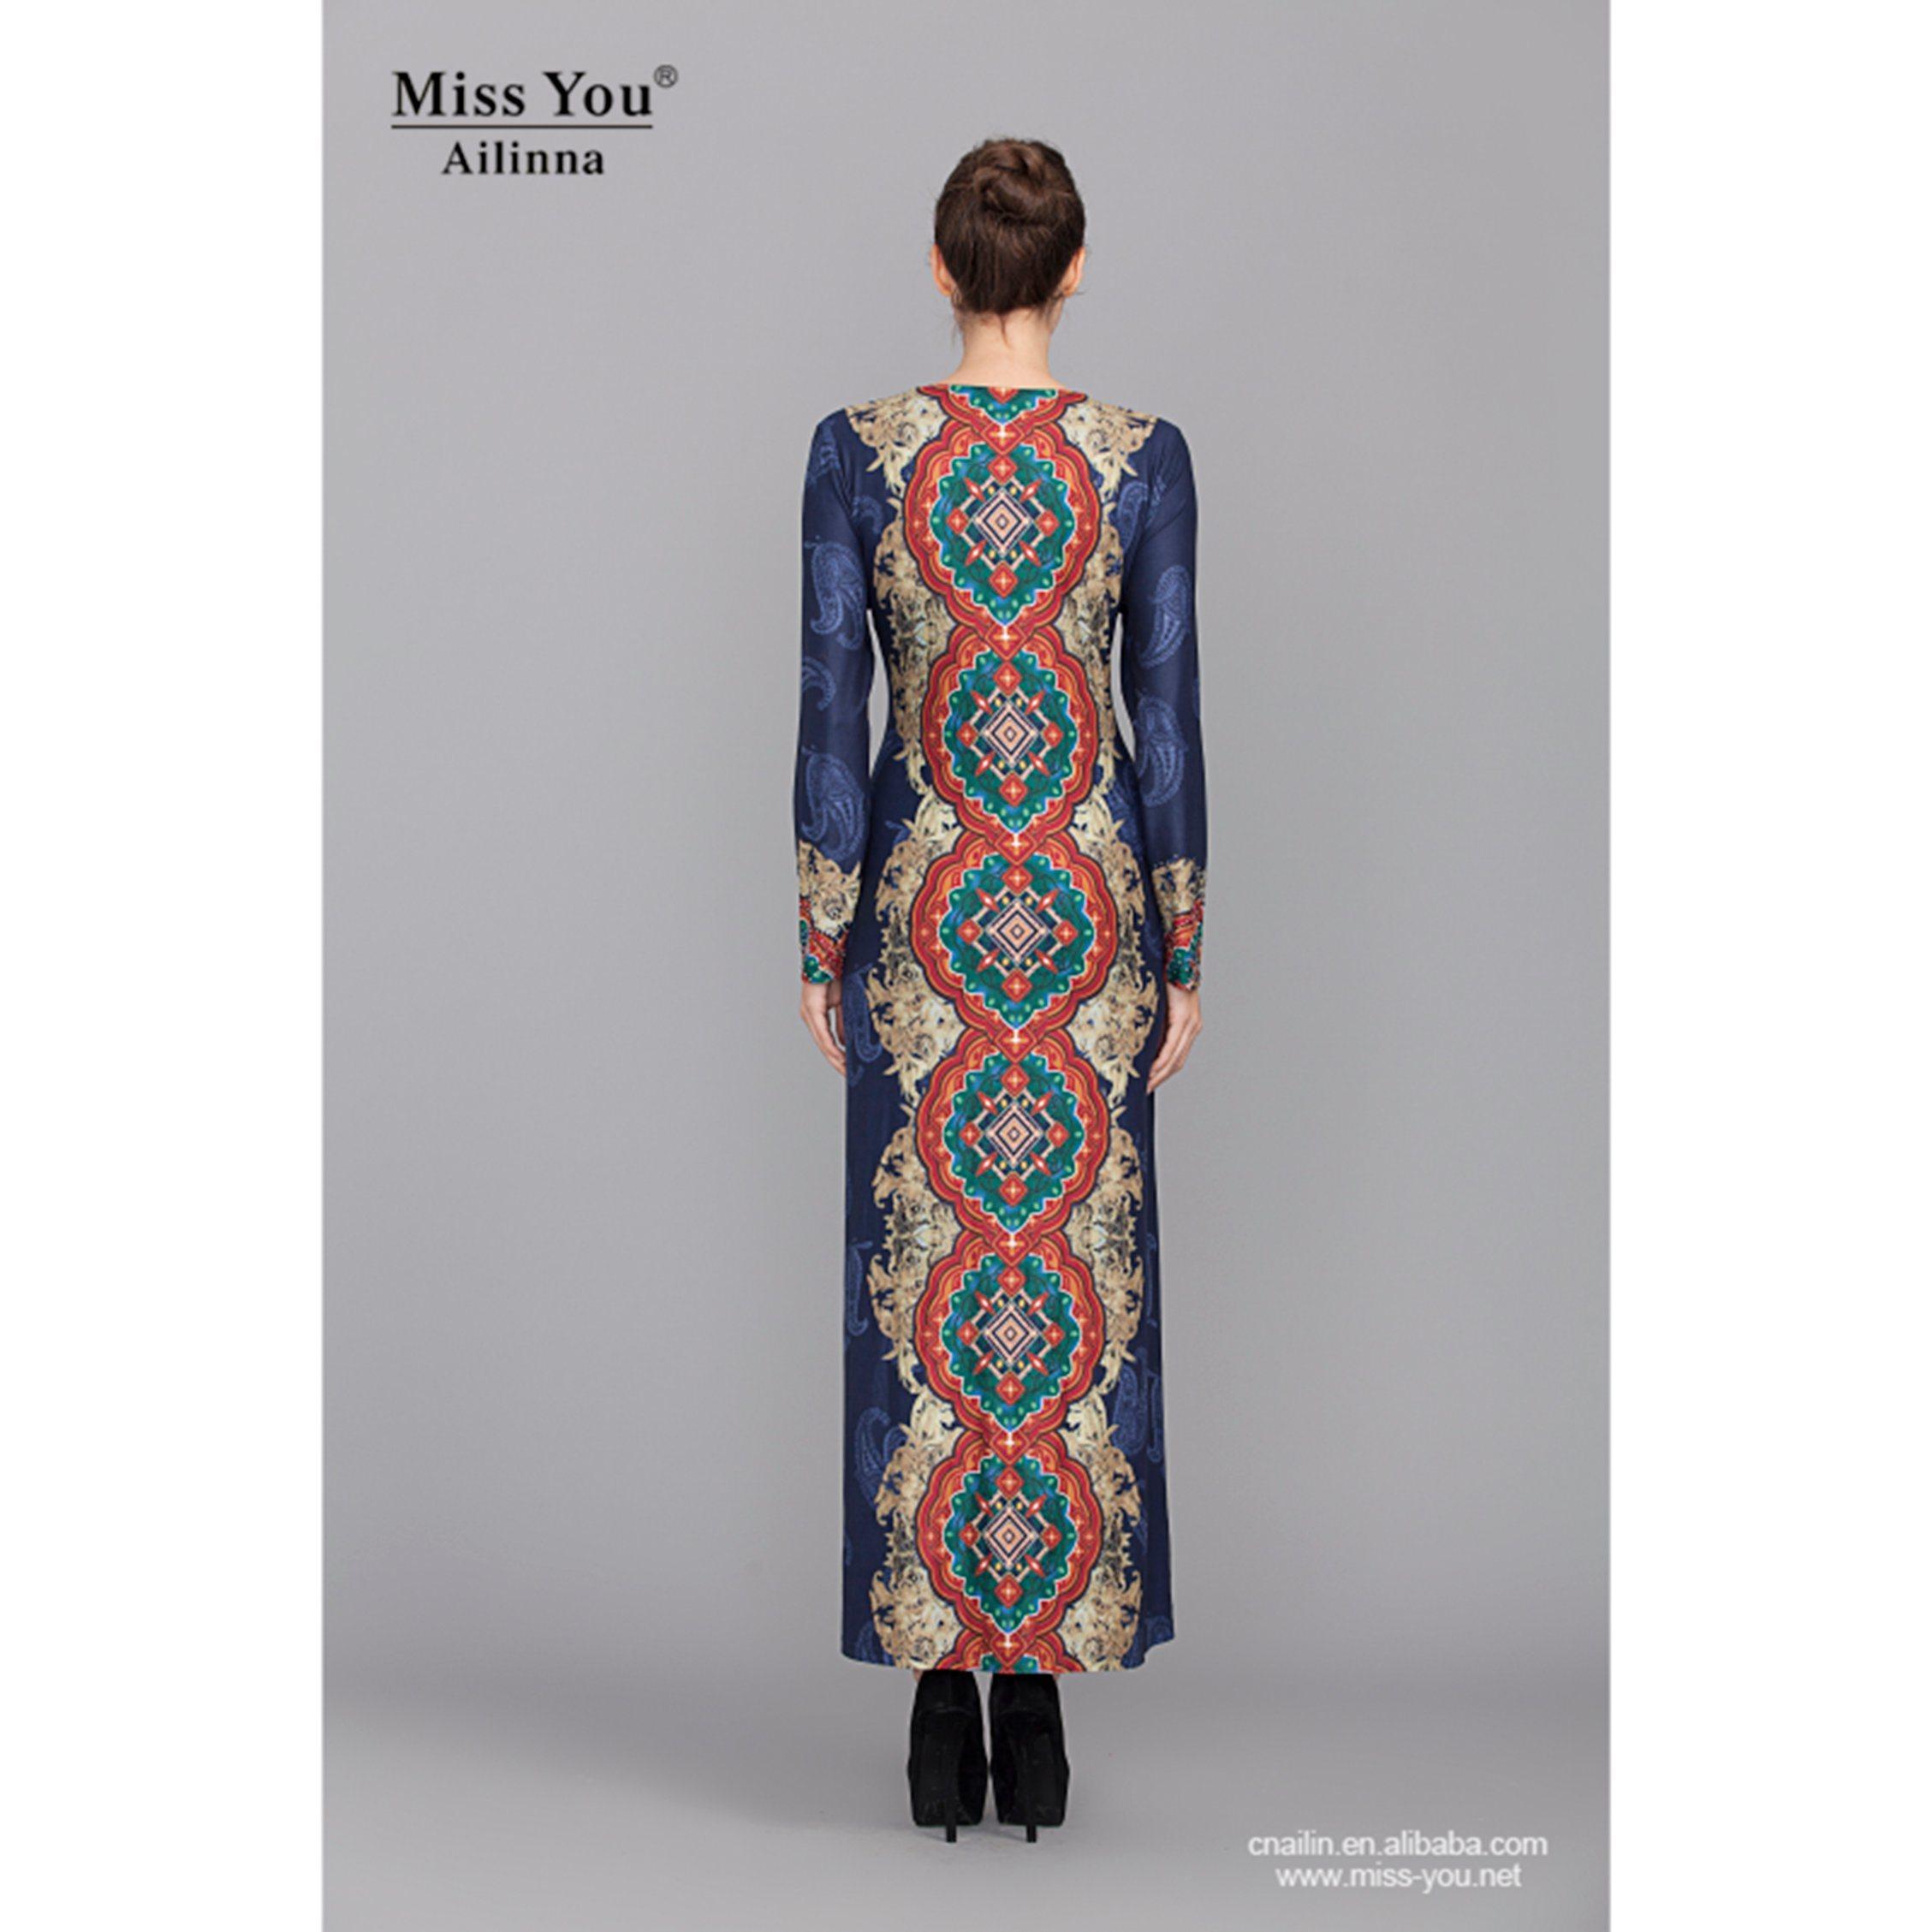 Miss You Ailinna 801968 Ladies Muslim Women Party Dress Abaya